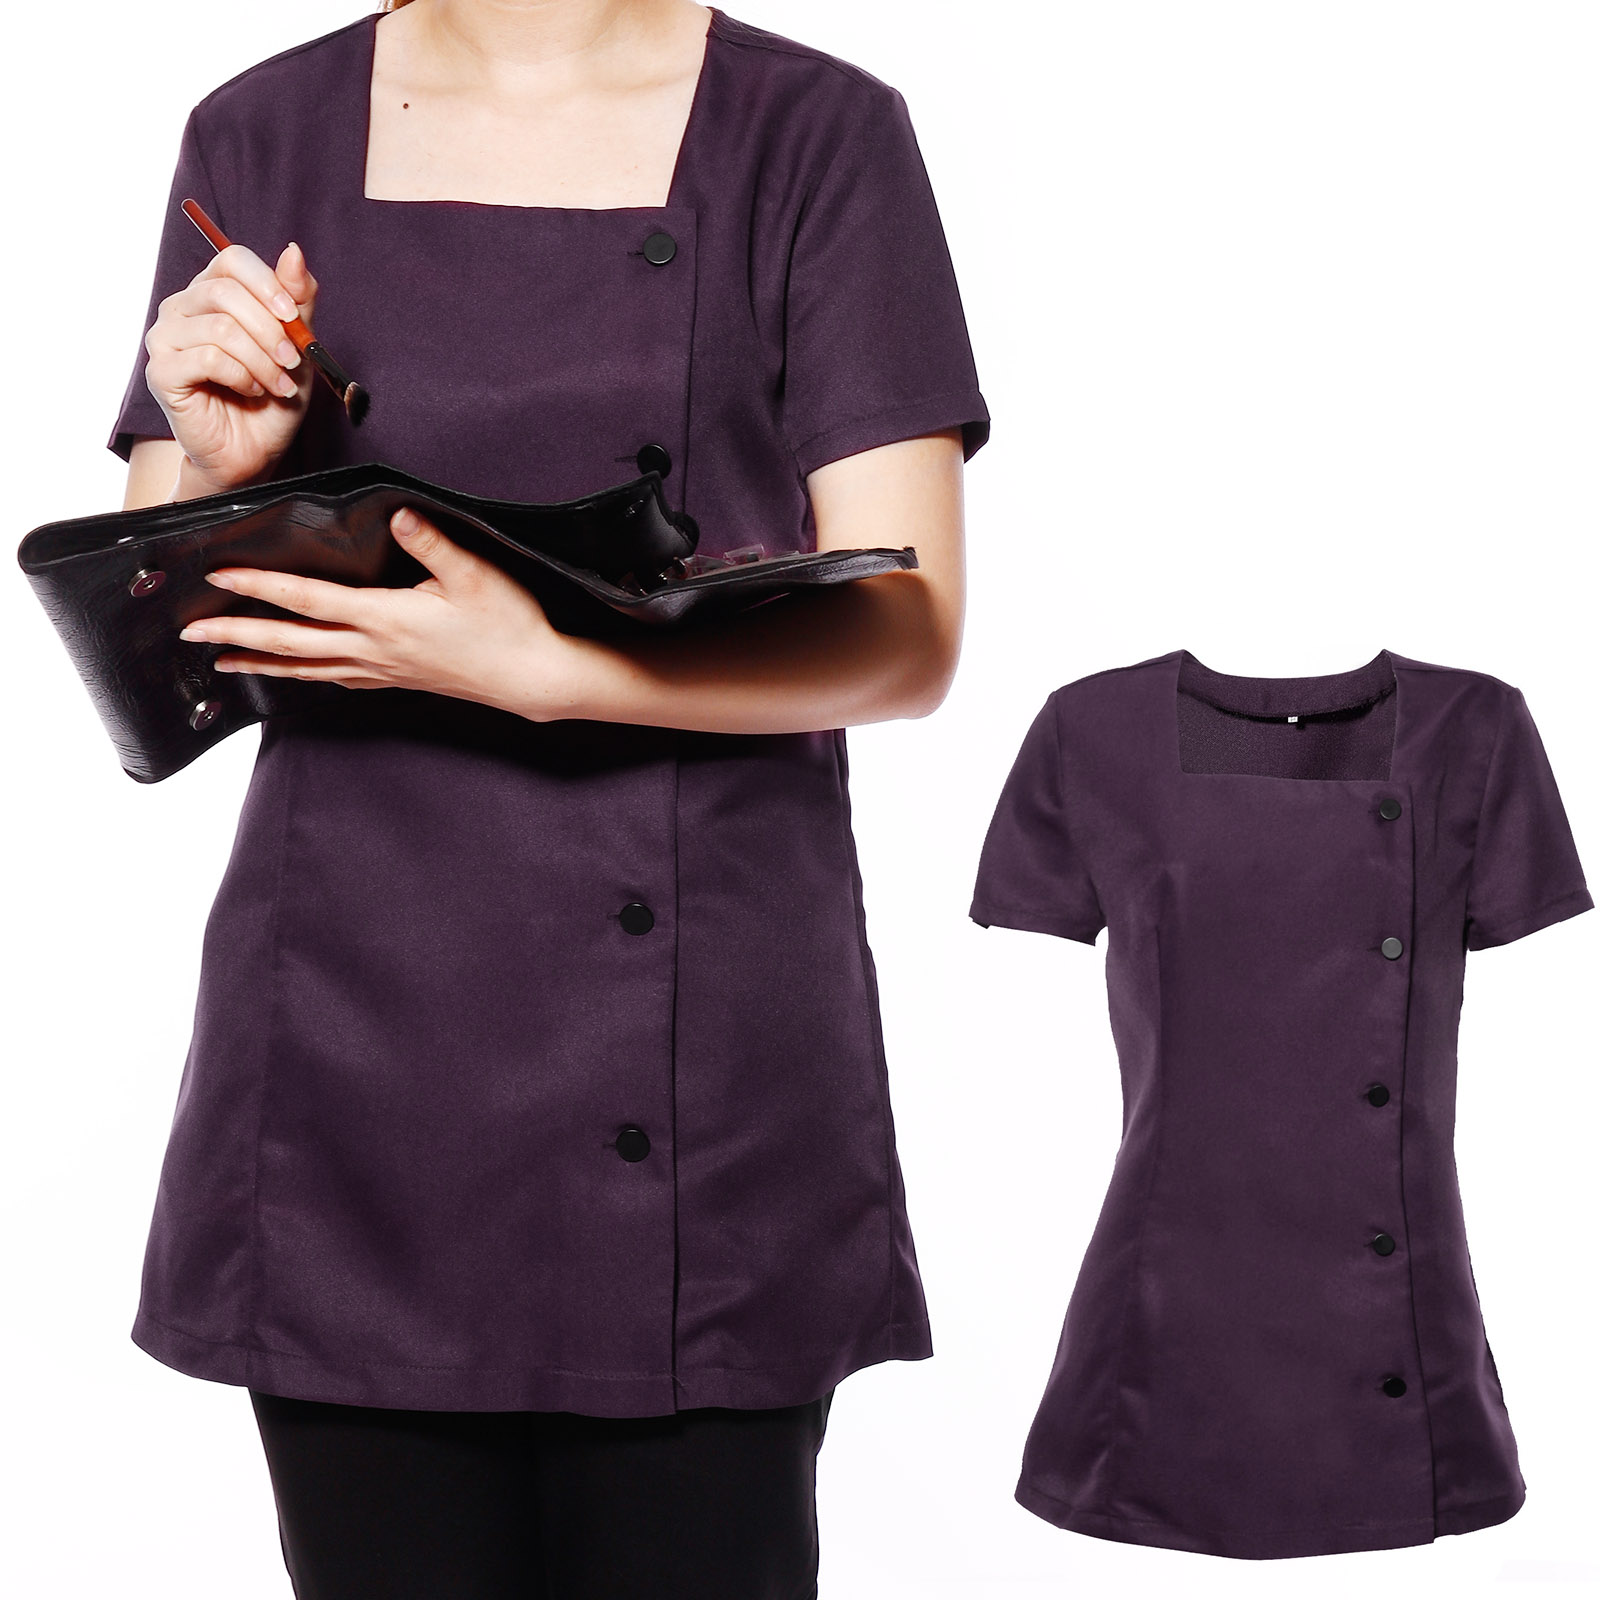 Beauty spa nail salon therapist massage tunic uniform for Uniform nail spa